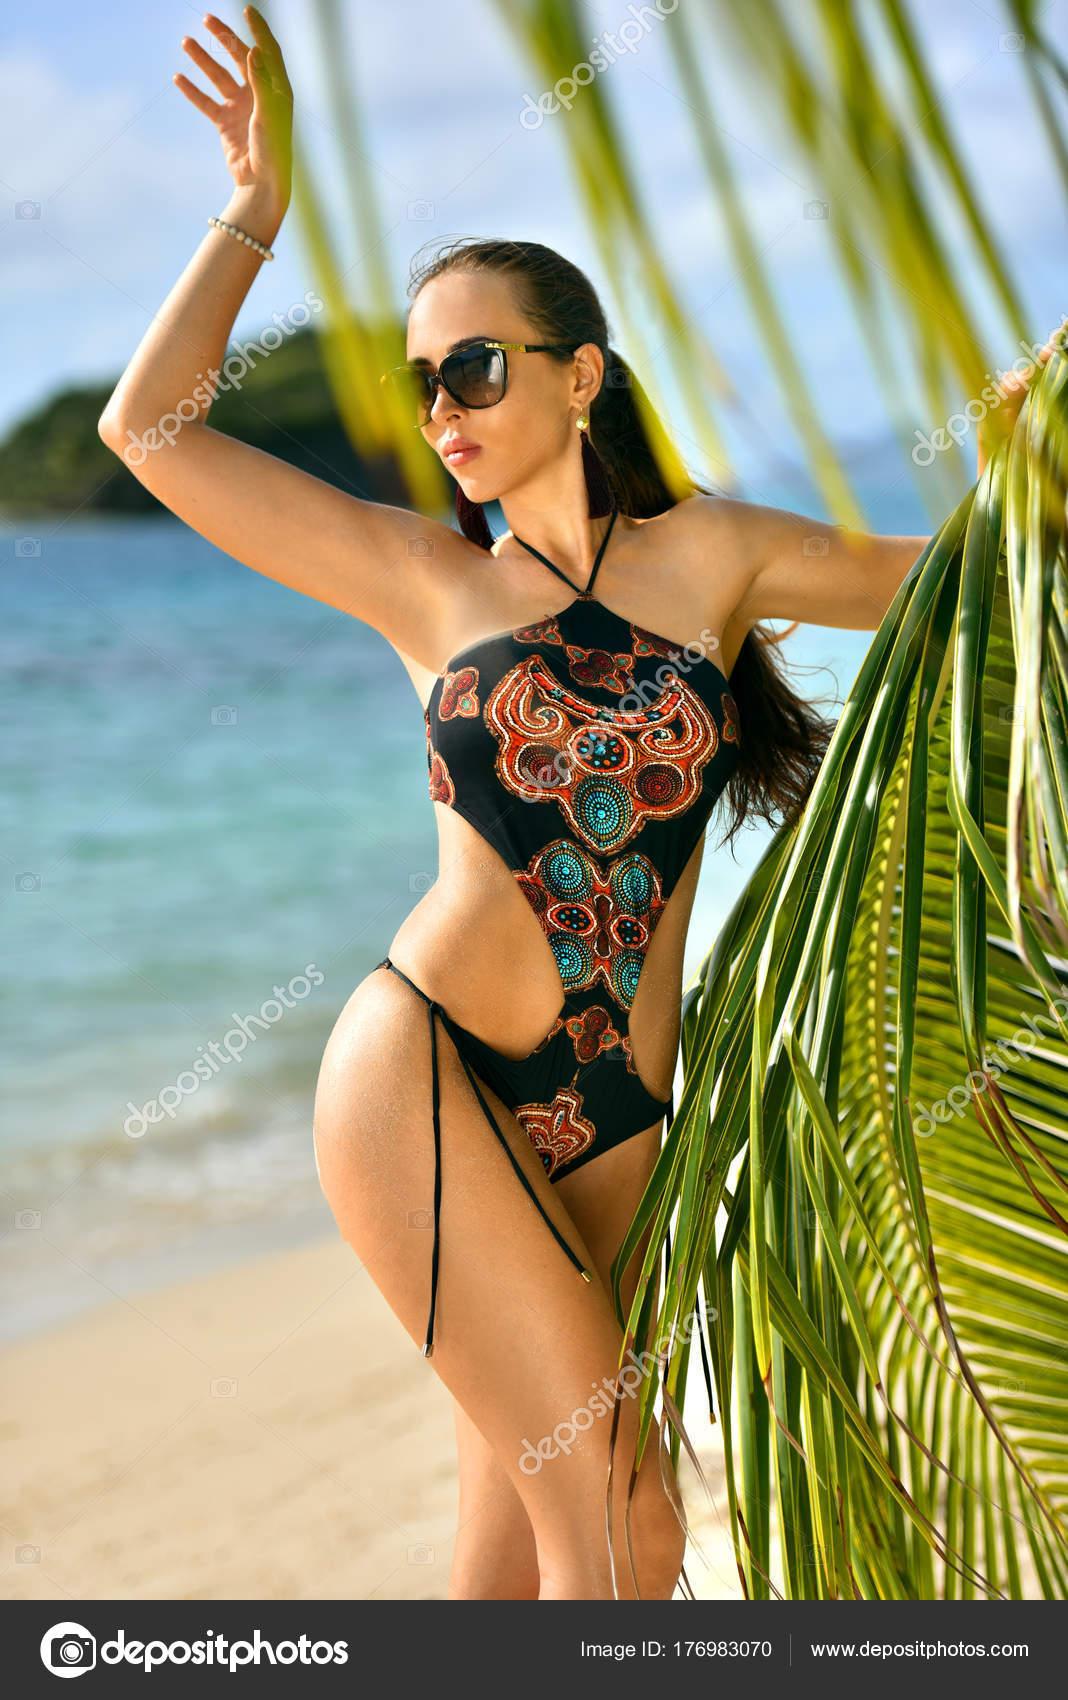 7d523d78fbdd Fotos: modelos en traje de baño en la playa | Impresionante Modelo ...